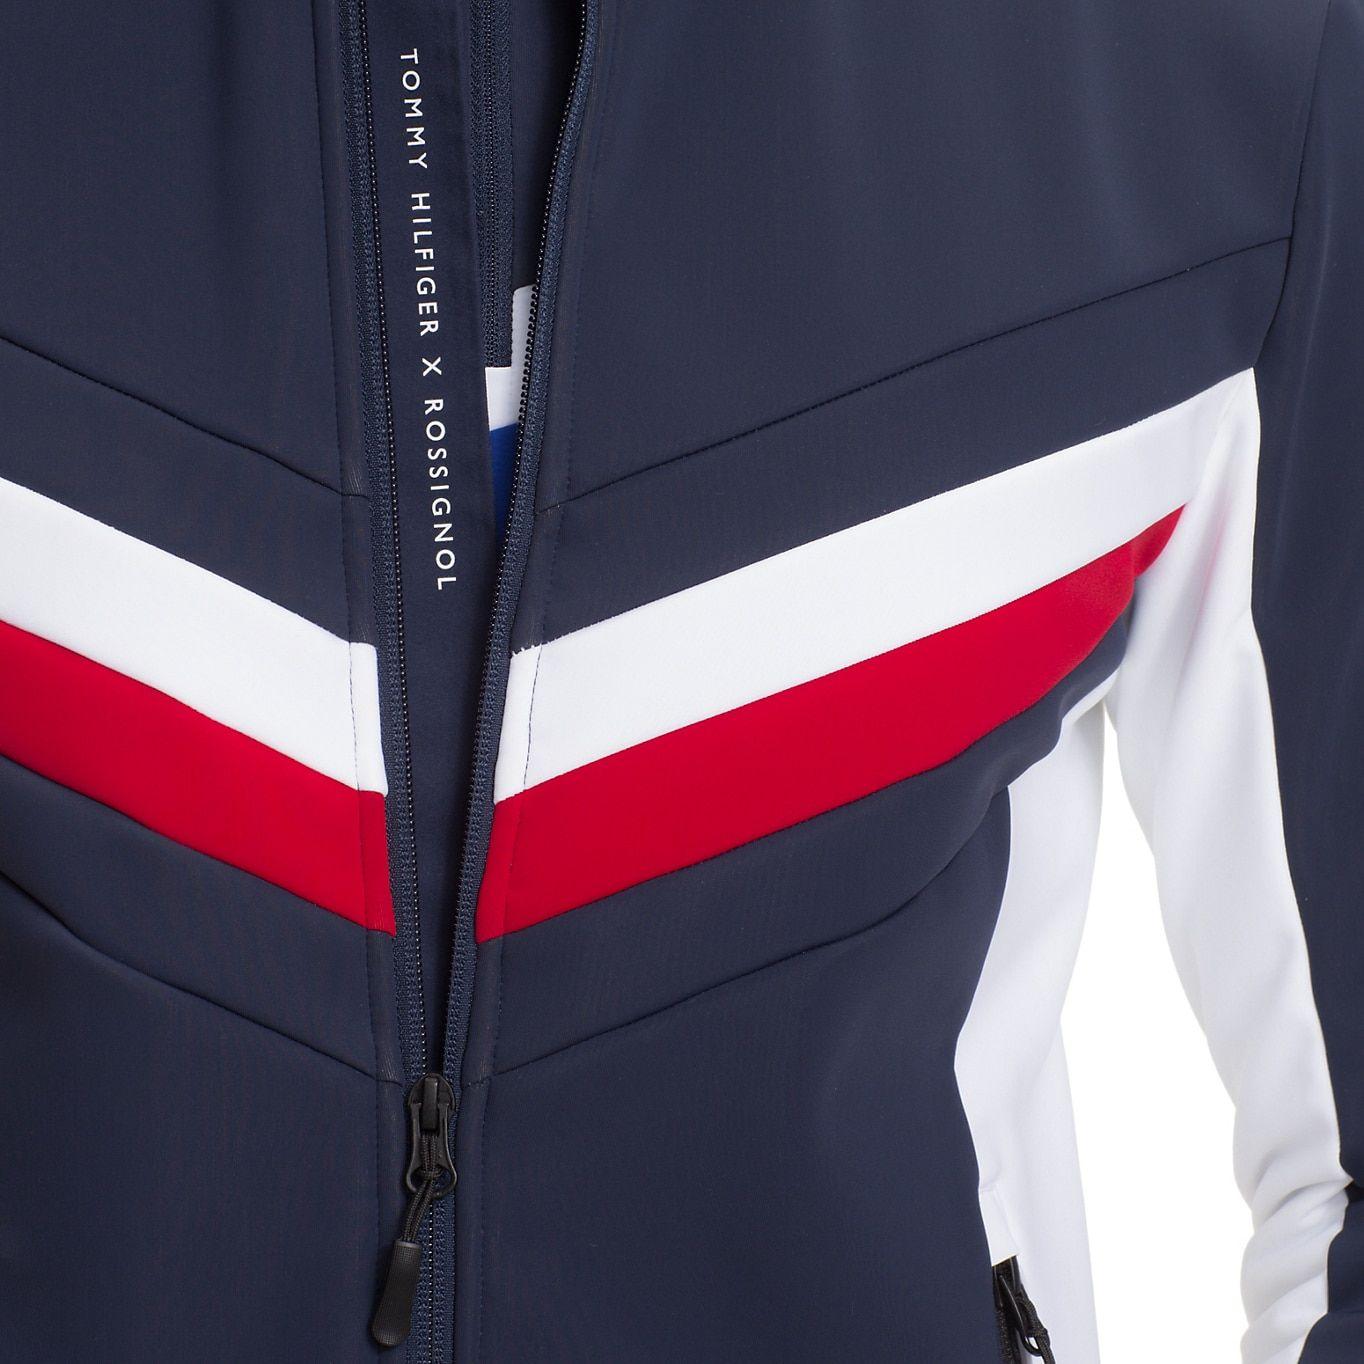 Rossignol Zip Thru Cardigan Sky Captain Tommy Hilfiger Men S Coats Jackets Outerwear Jackets Tommy Hilfiger [ 1364 x 1364 Pixel ]